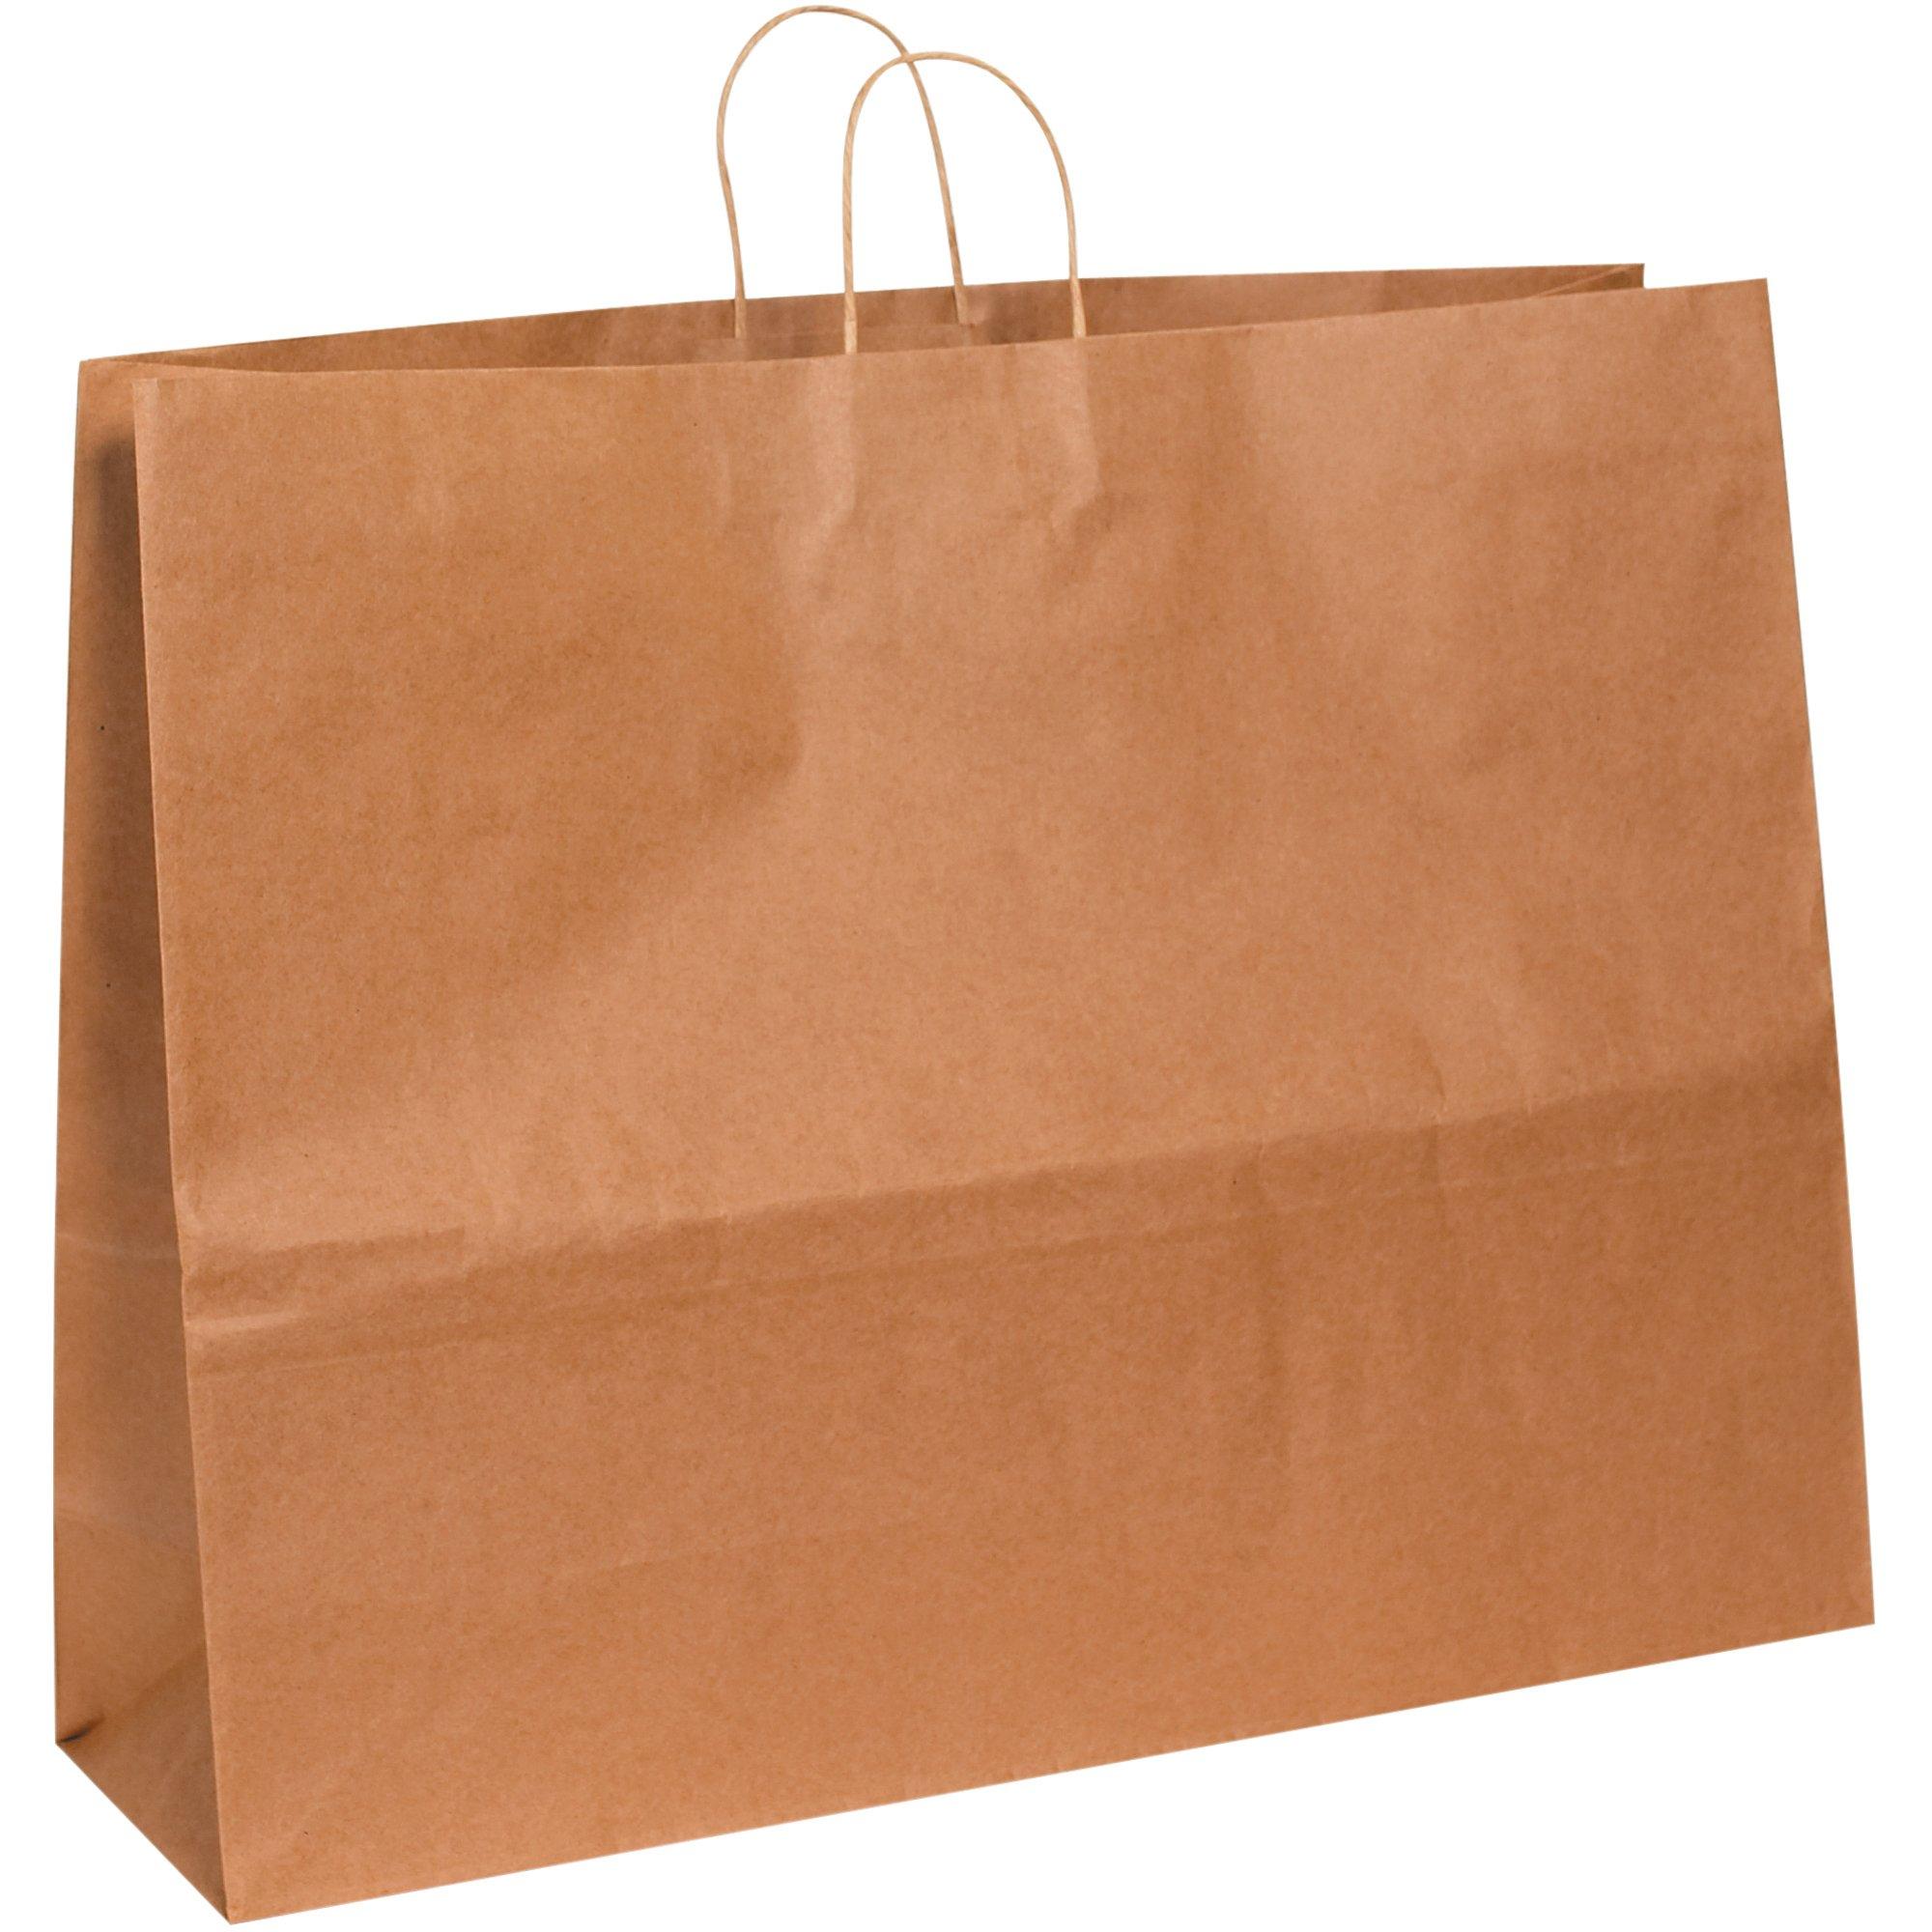 Paper Shopping Bags, 24'' x 7 1/4'' x 18 3/4'', White, 125/Case